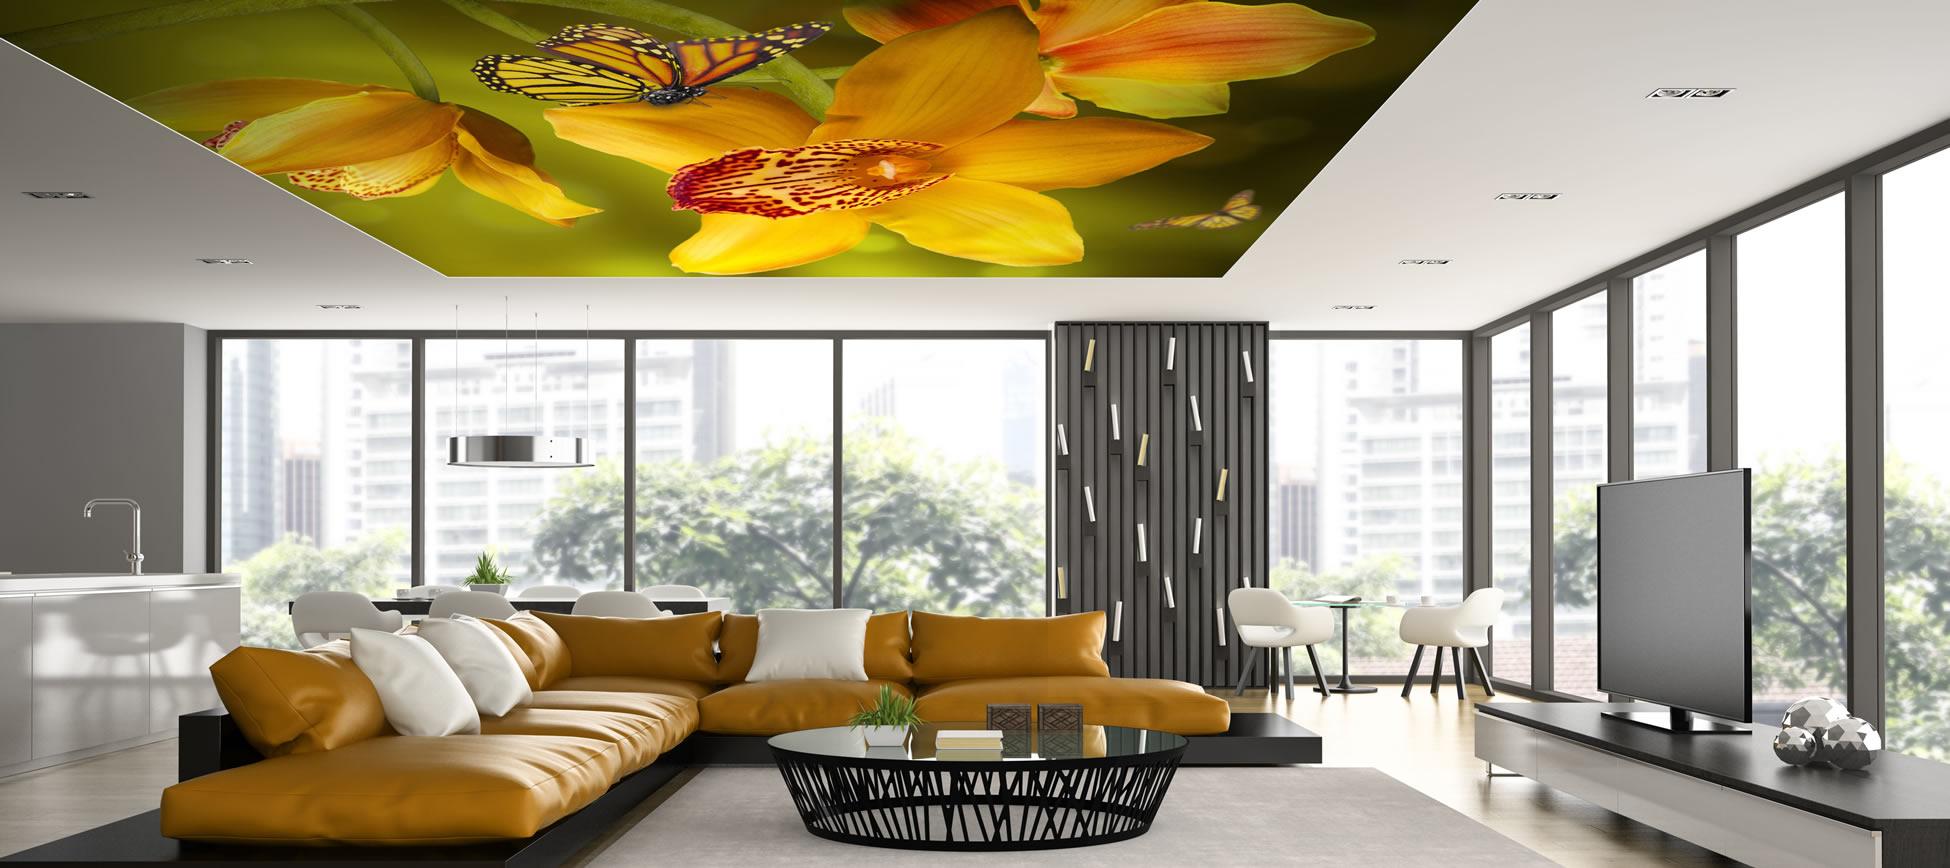 Related pictures gergi tavan barrisol barisol modelleri pictures to - Dijital Bask Gergi Tavan Sistemleri